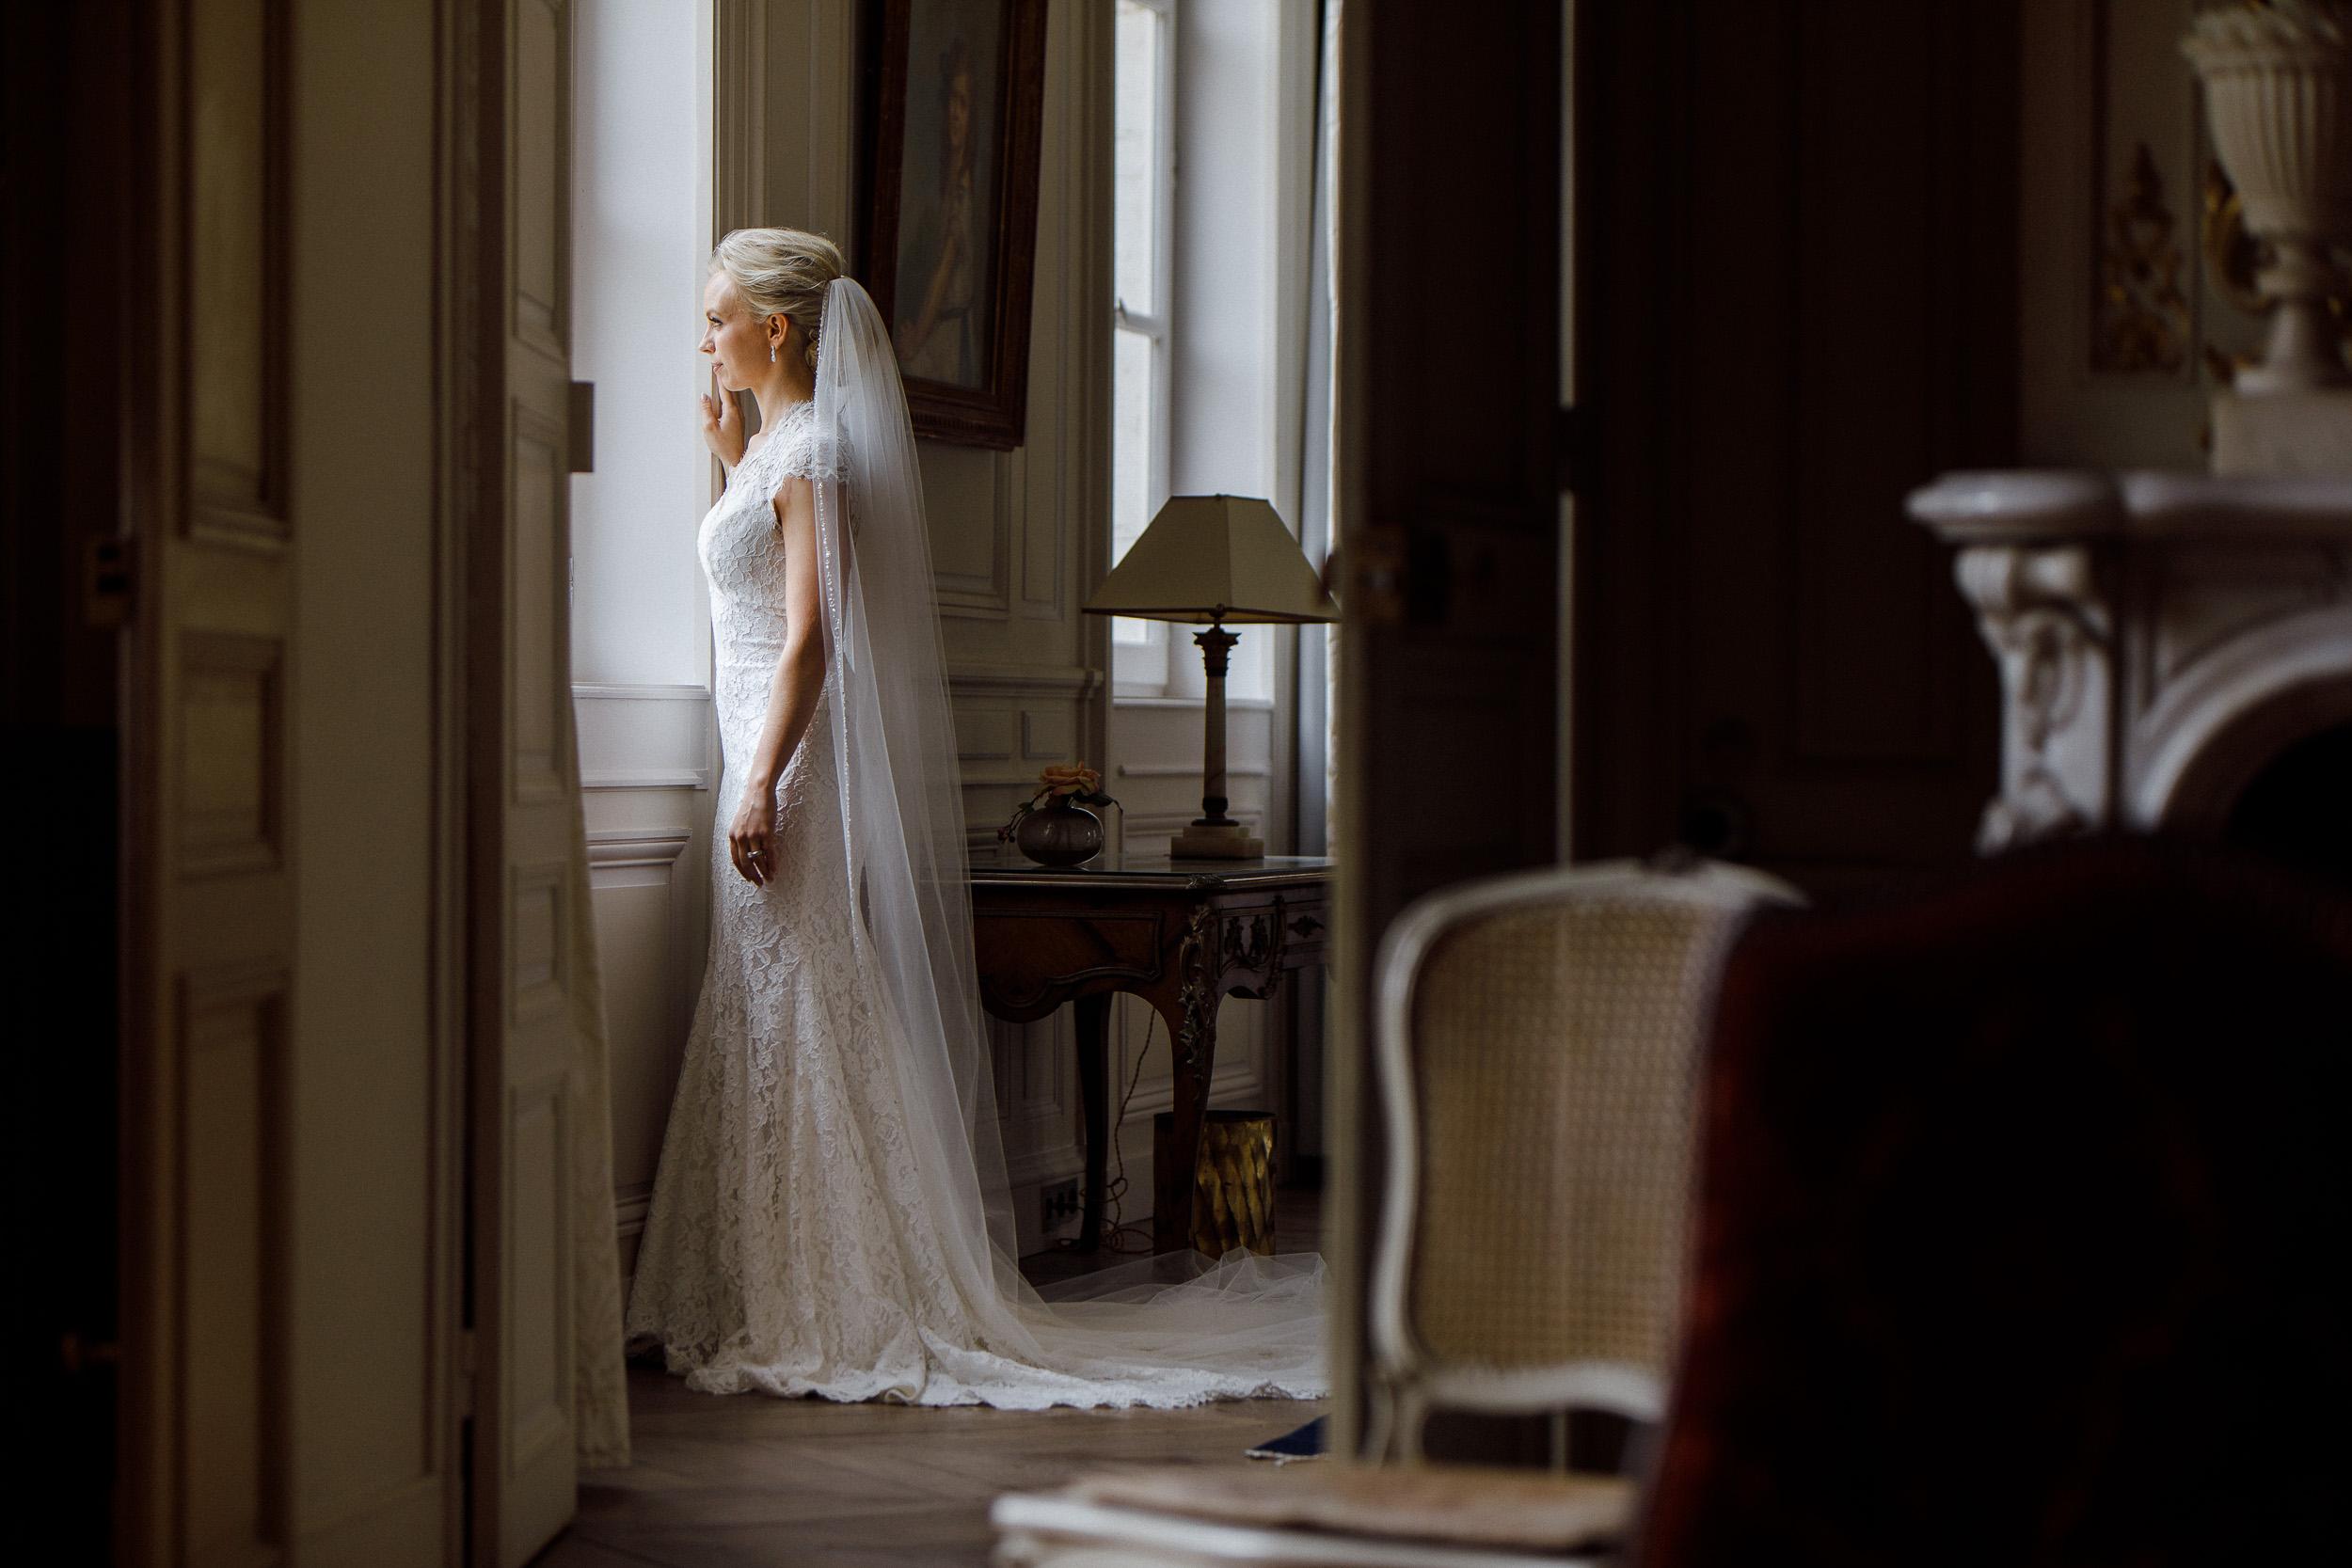 Wedding-Chateau-de-Varennes-038.jpg